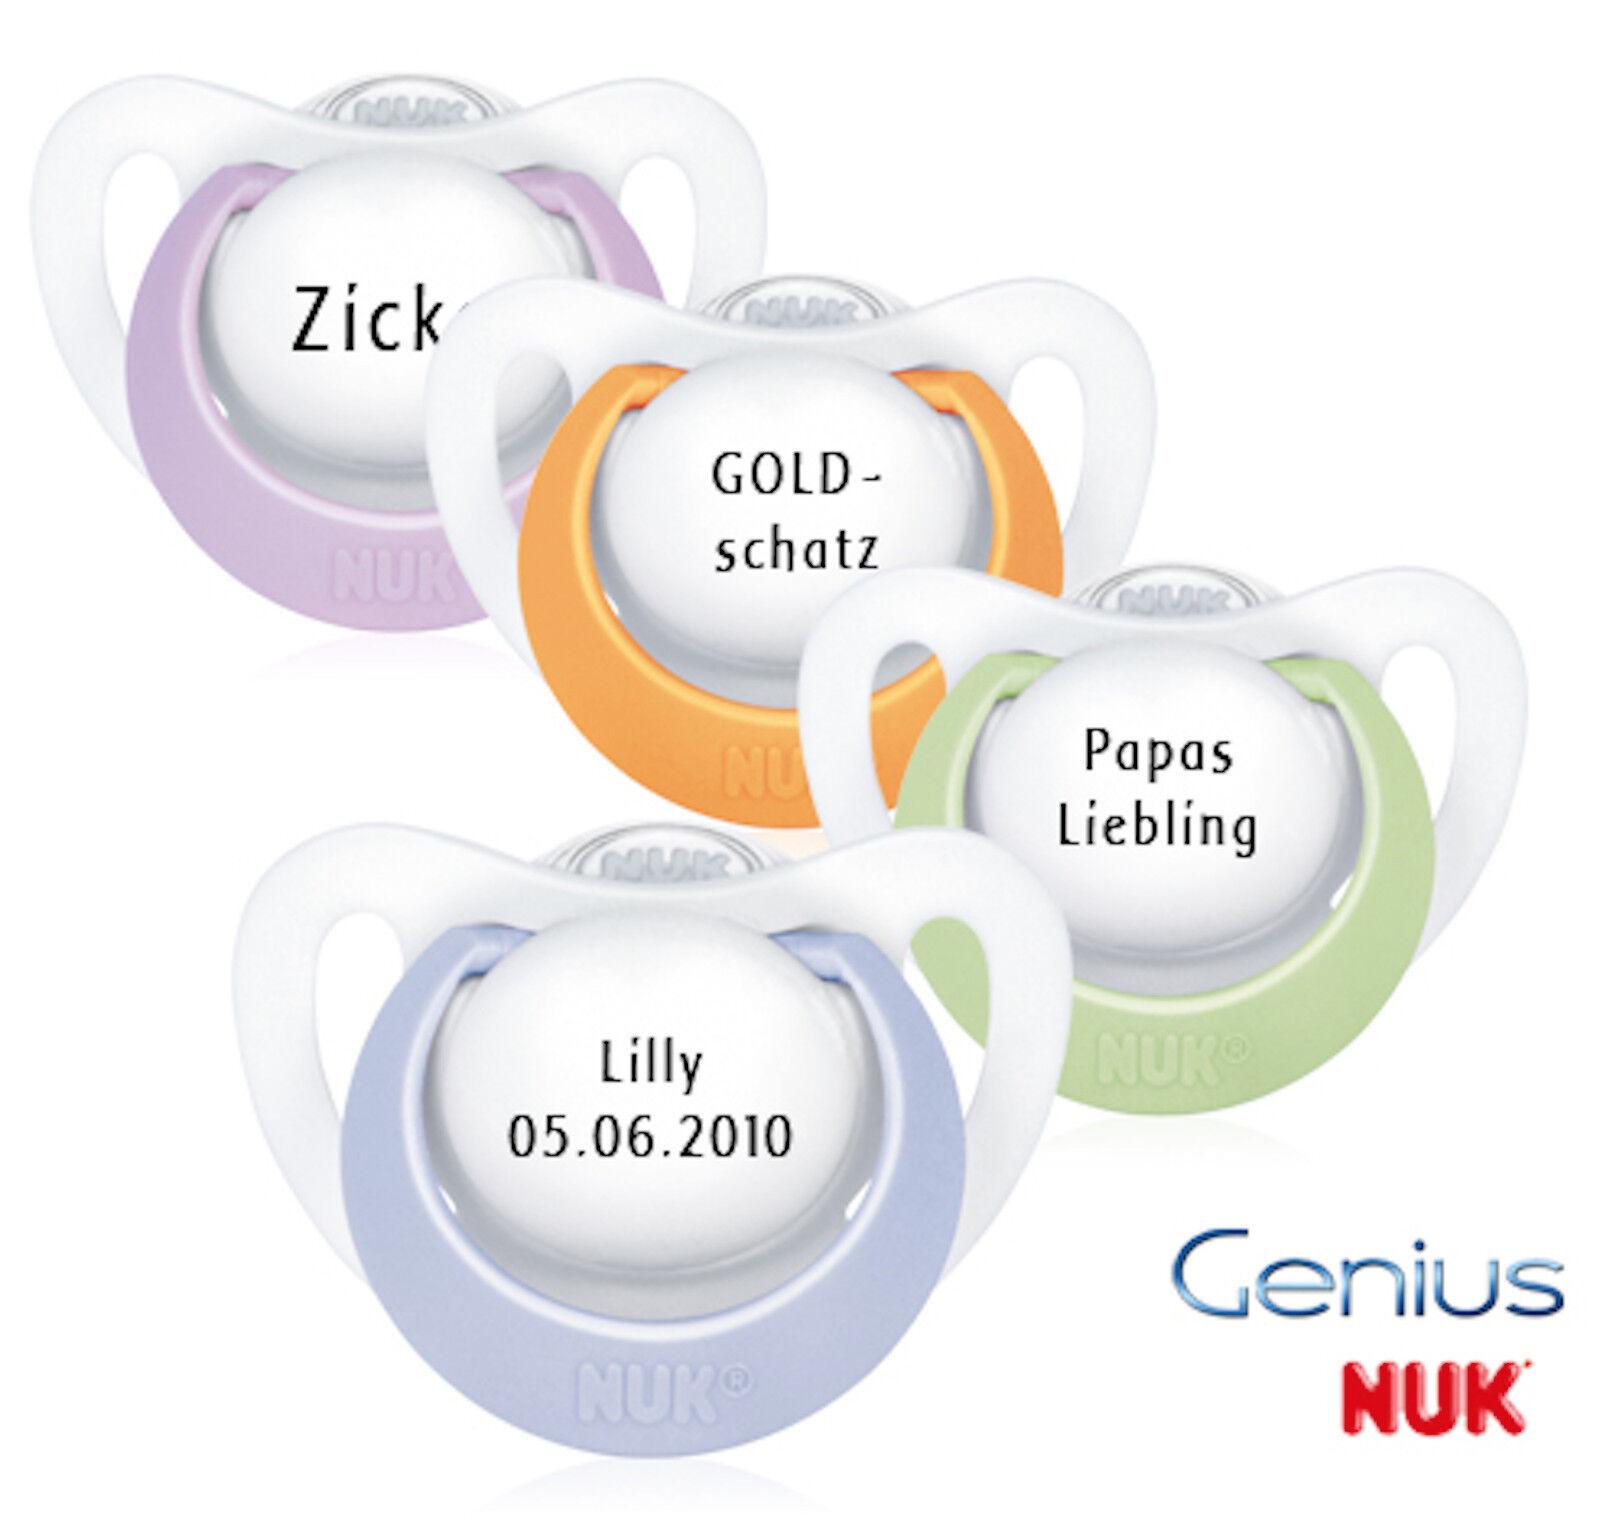 Nuk Genius Namensschnuller - Schnuller mit Namen - 2 Stück - Silikon - Gr. 2